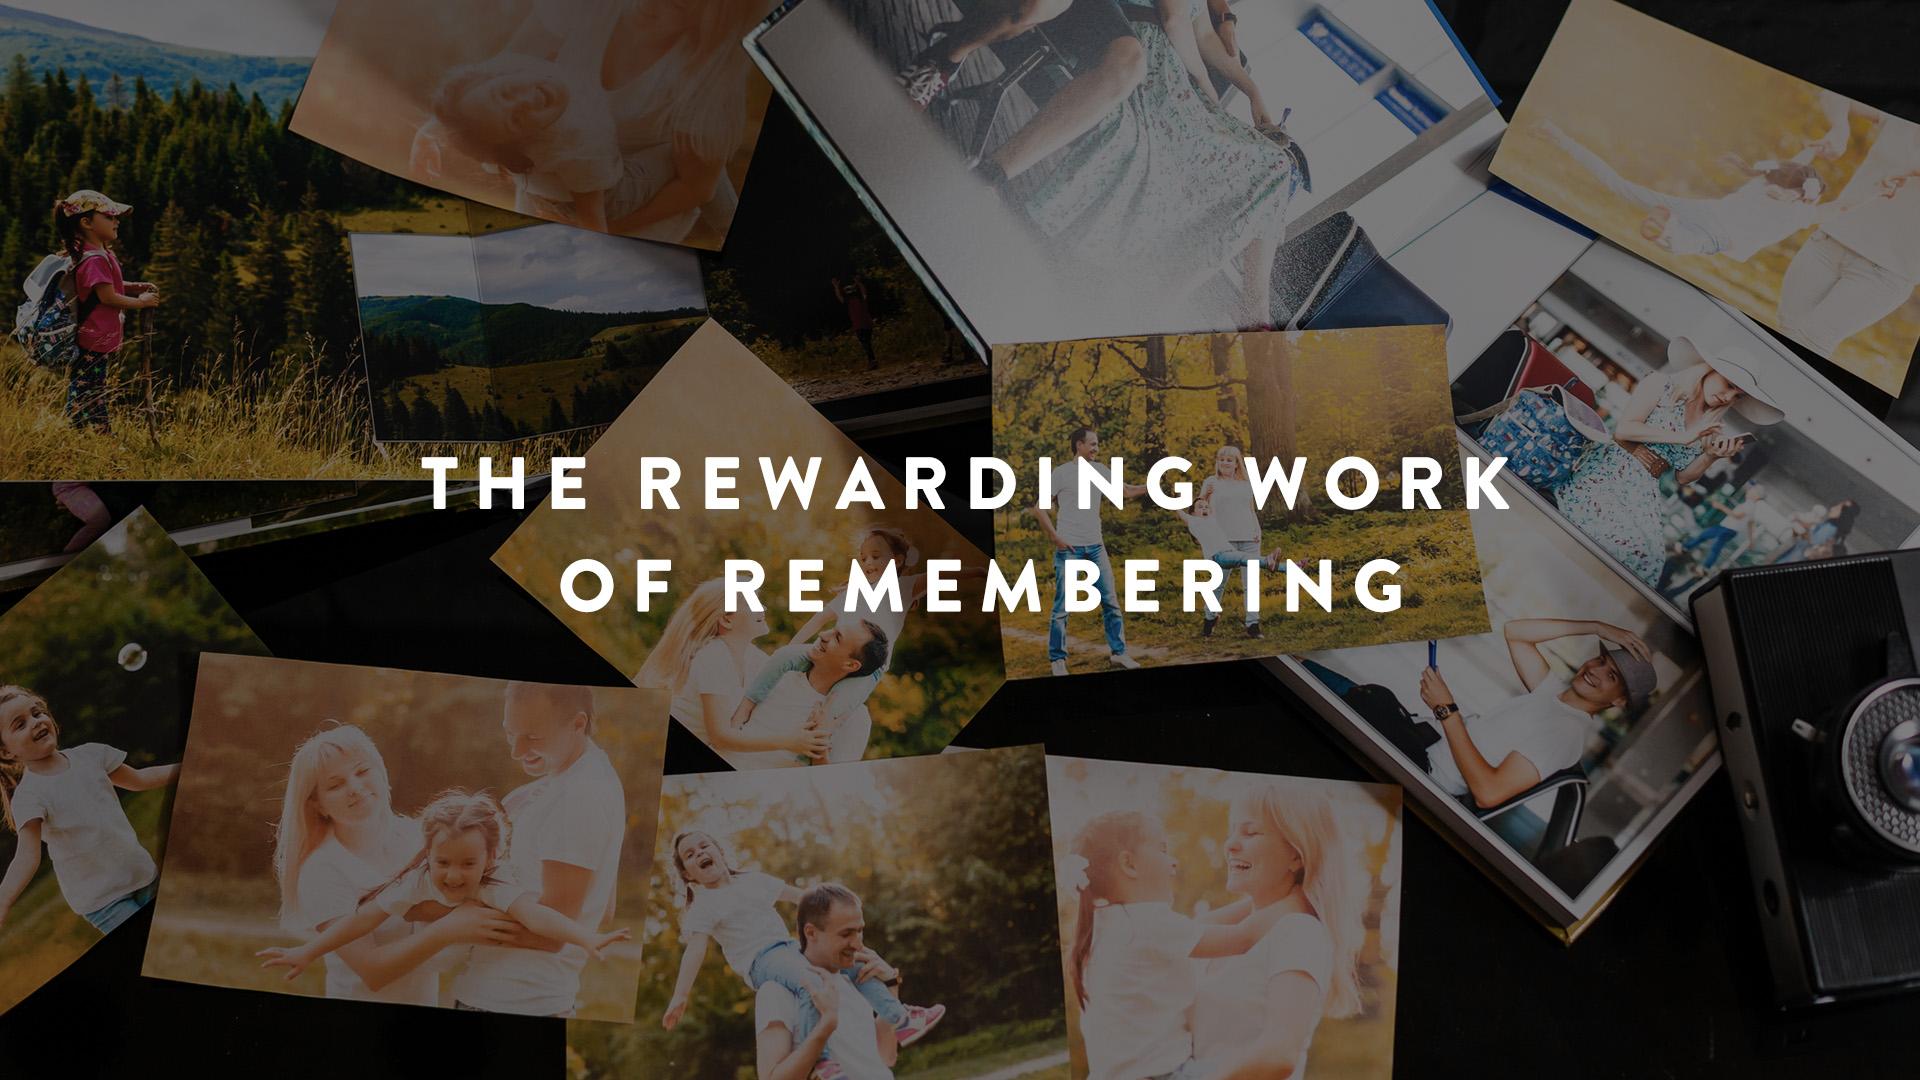 The rewarding work of remembering